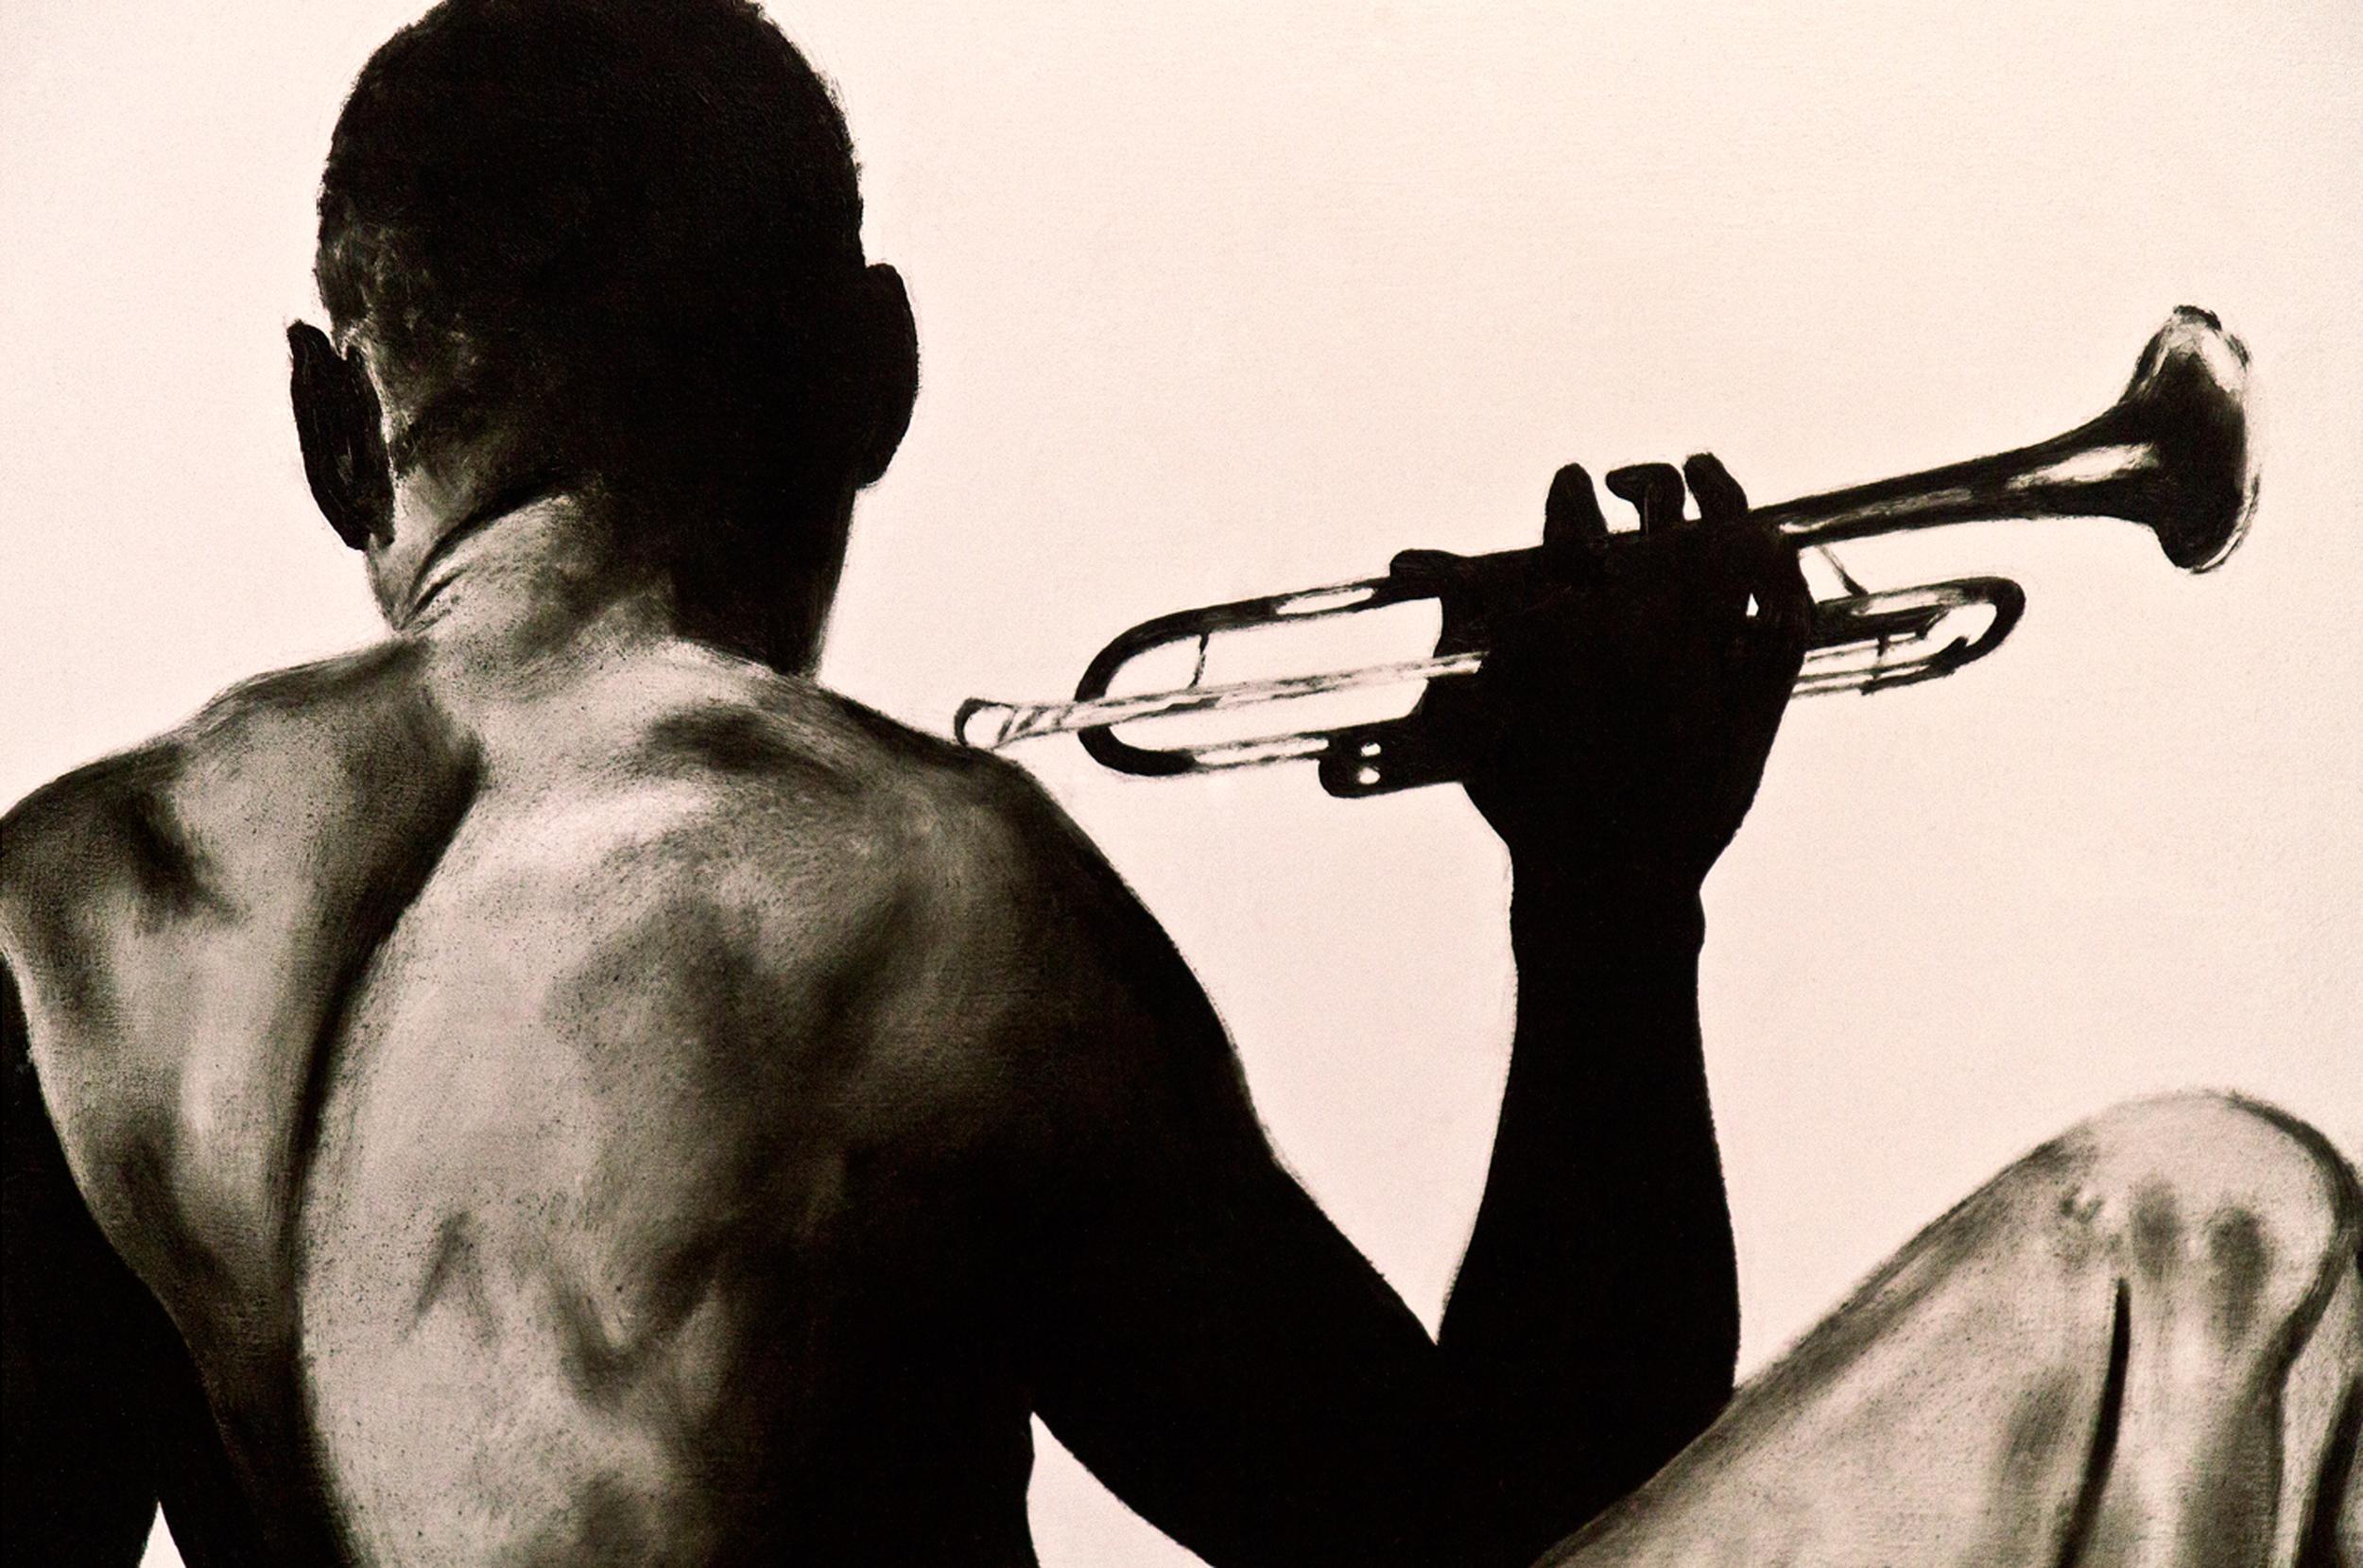 trumpet player_action_12x18.jpg